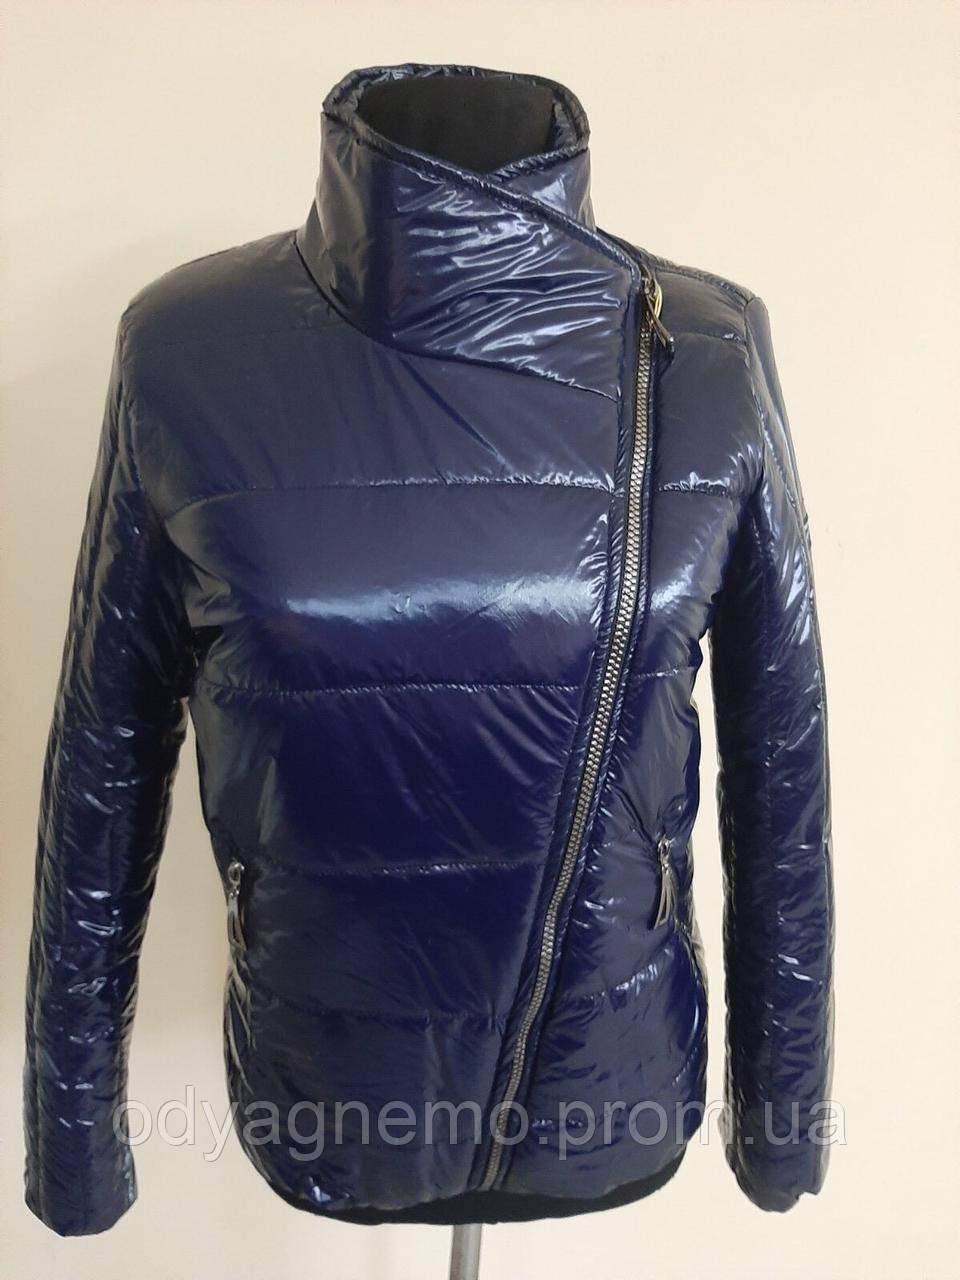 Куртка для девочки Vo.brend оптом, 140-164 рр.